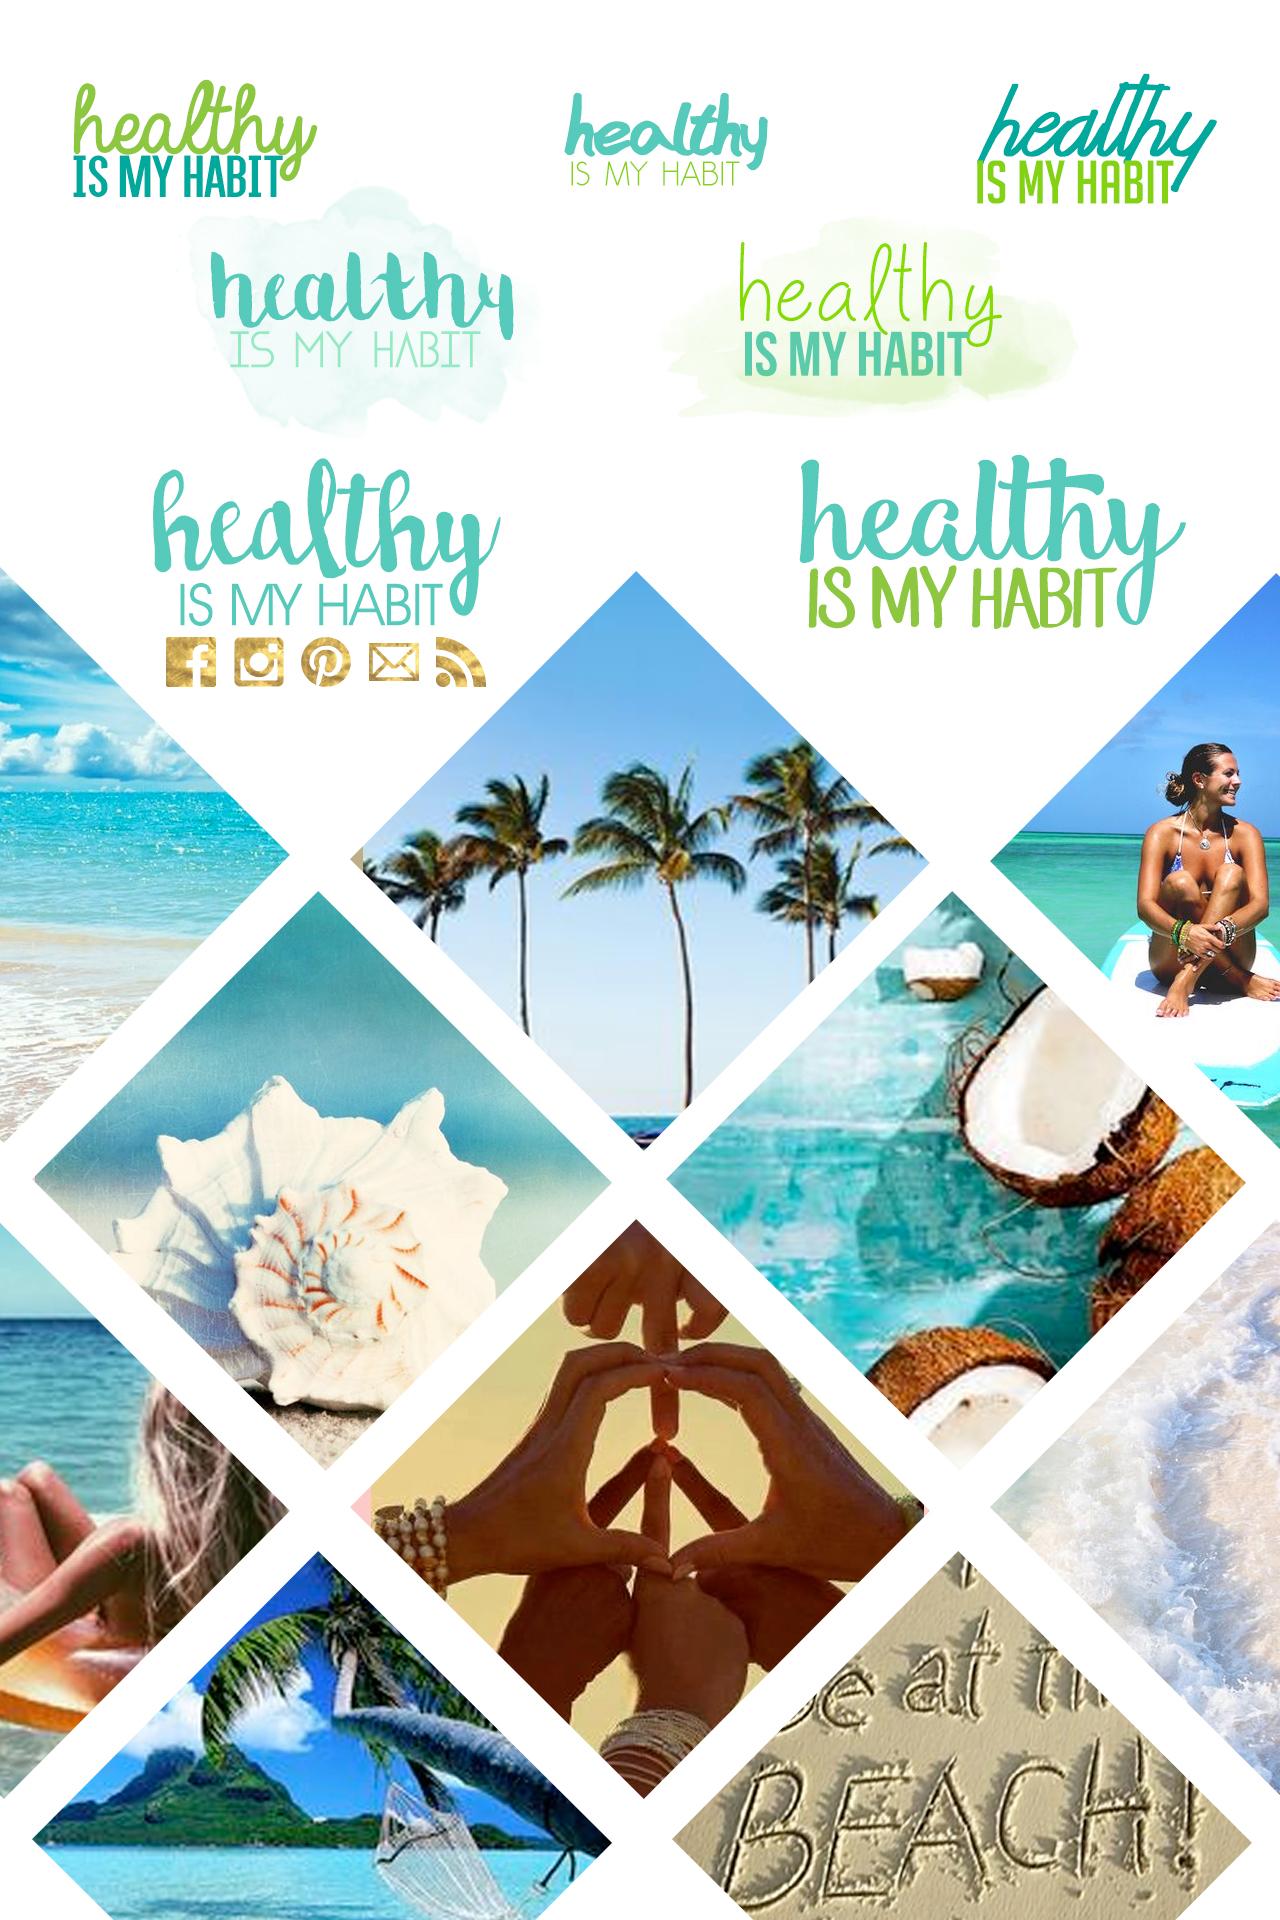 HEALTHYISMYHABIT.COM